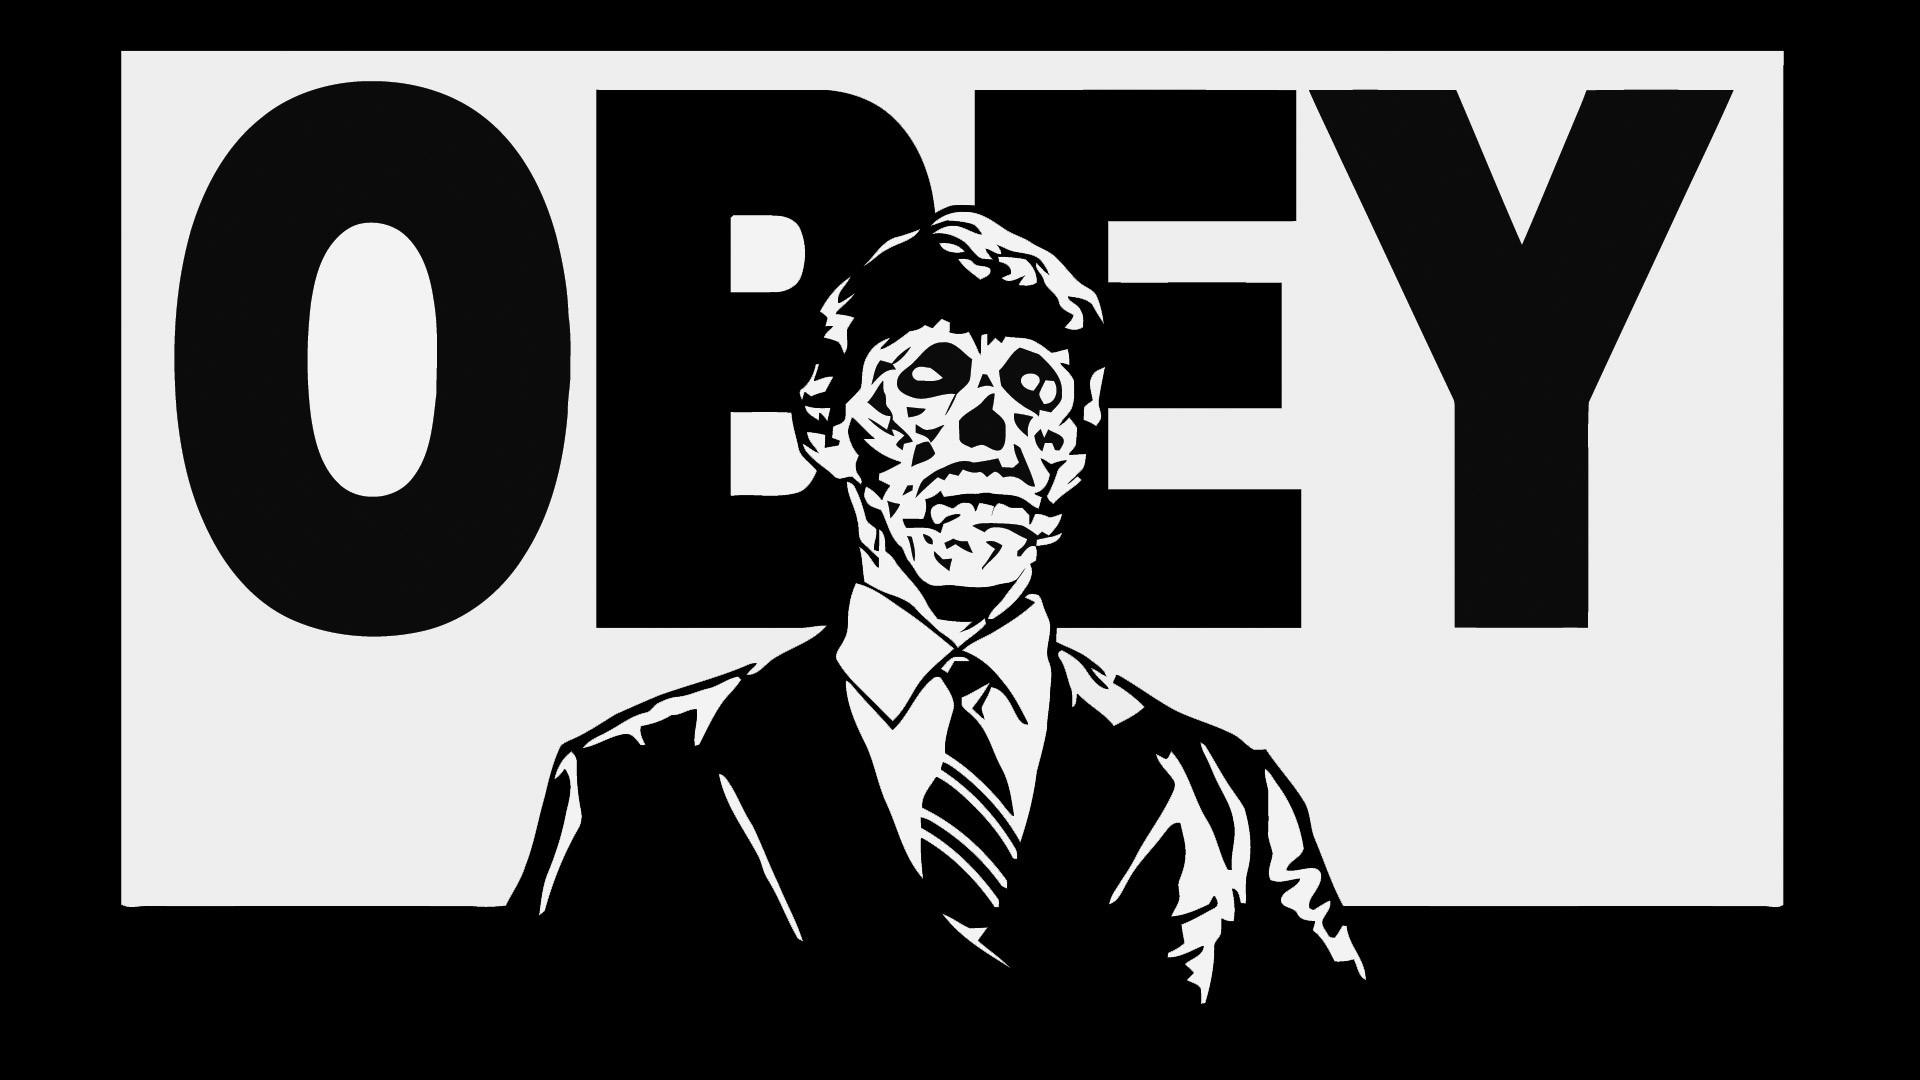 Obey Skeleton Logo Wallpaper